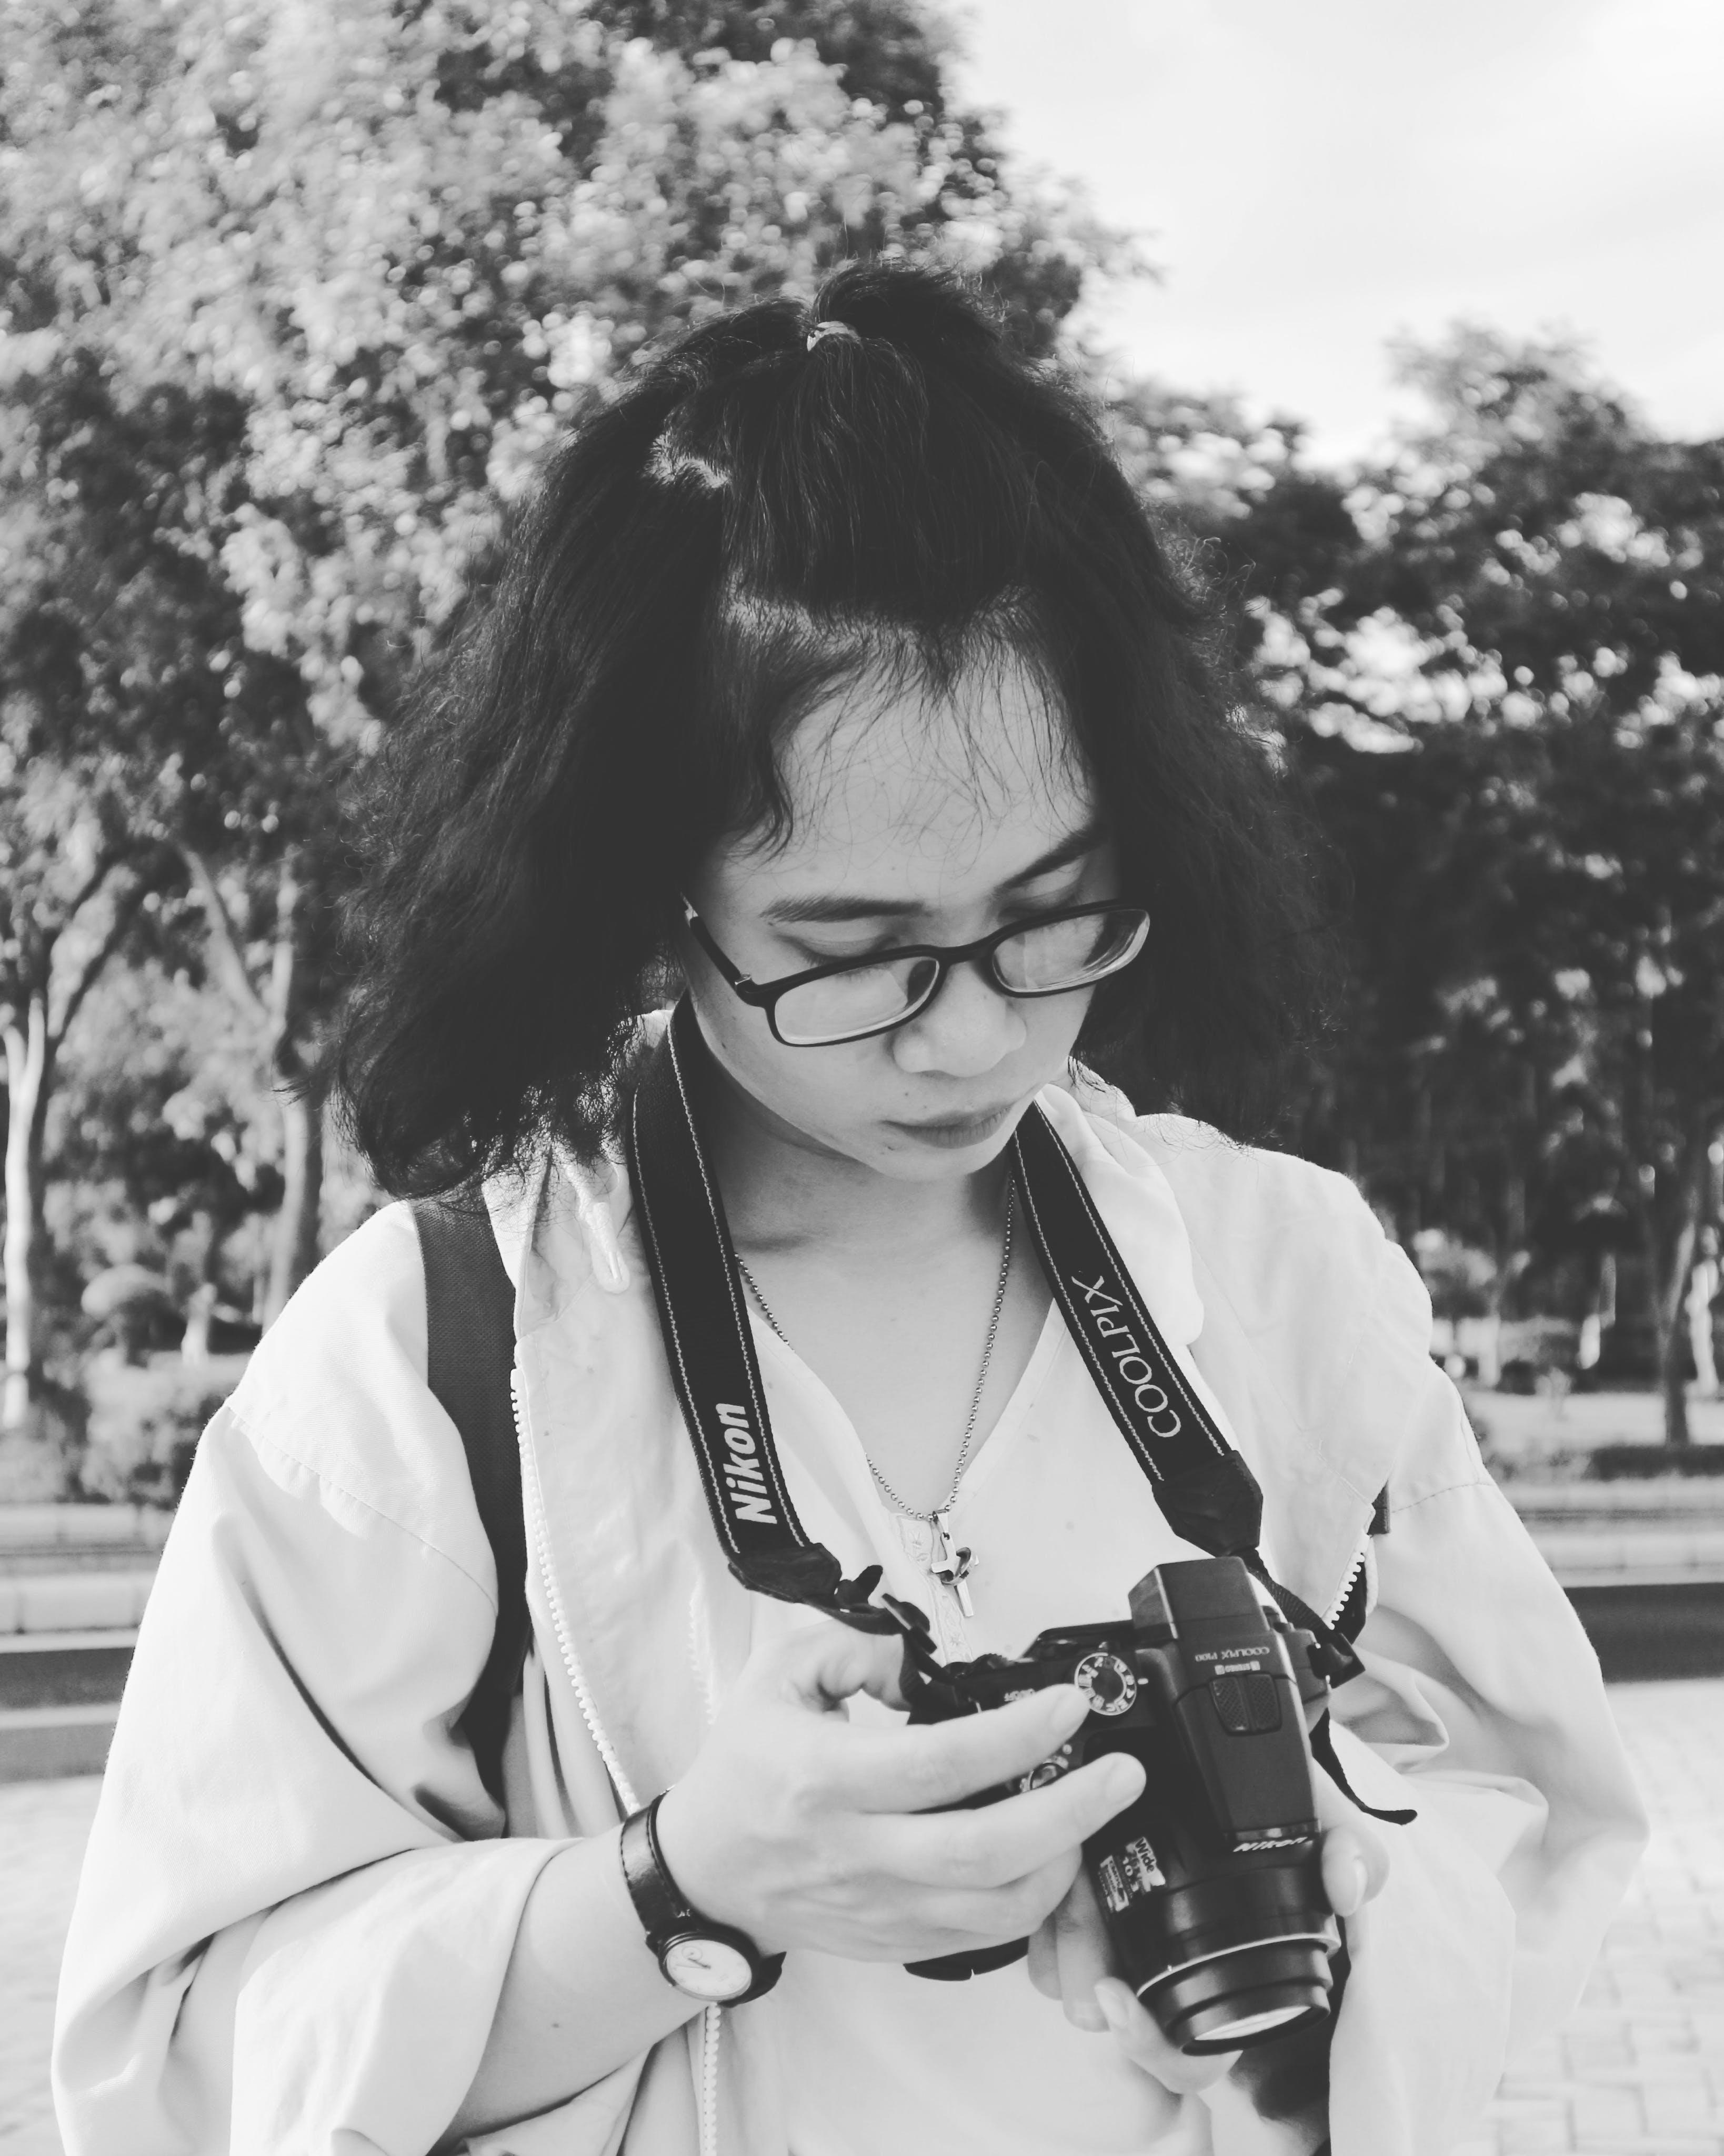 Grayscale Photo of Woman Holding Black Nikon Coolpix Dslr Camera